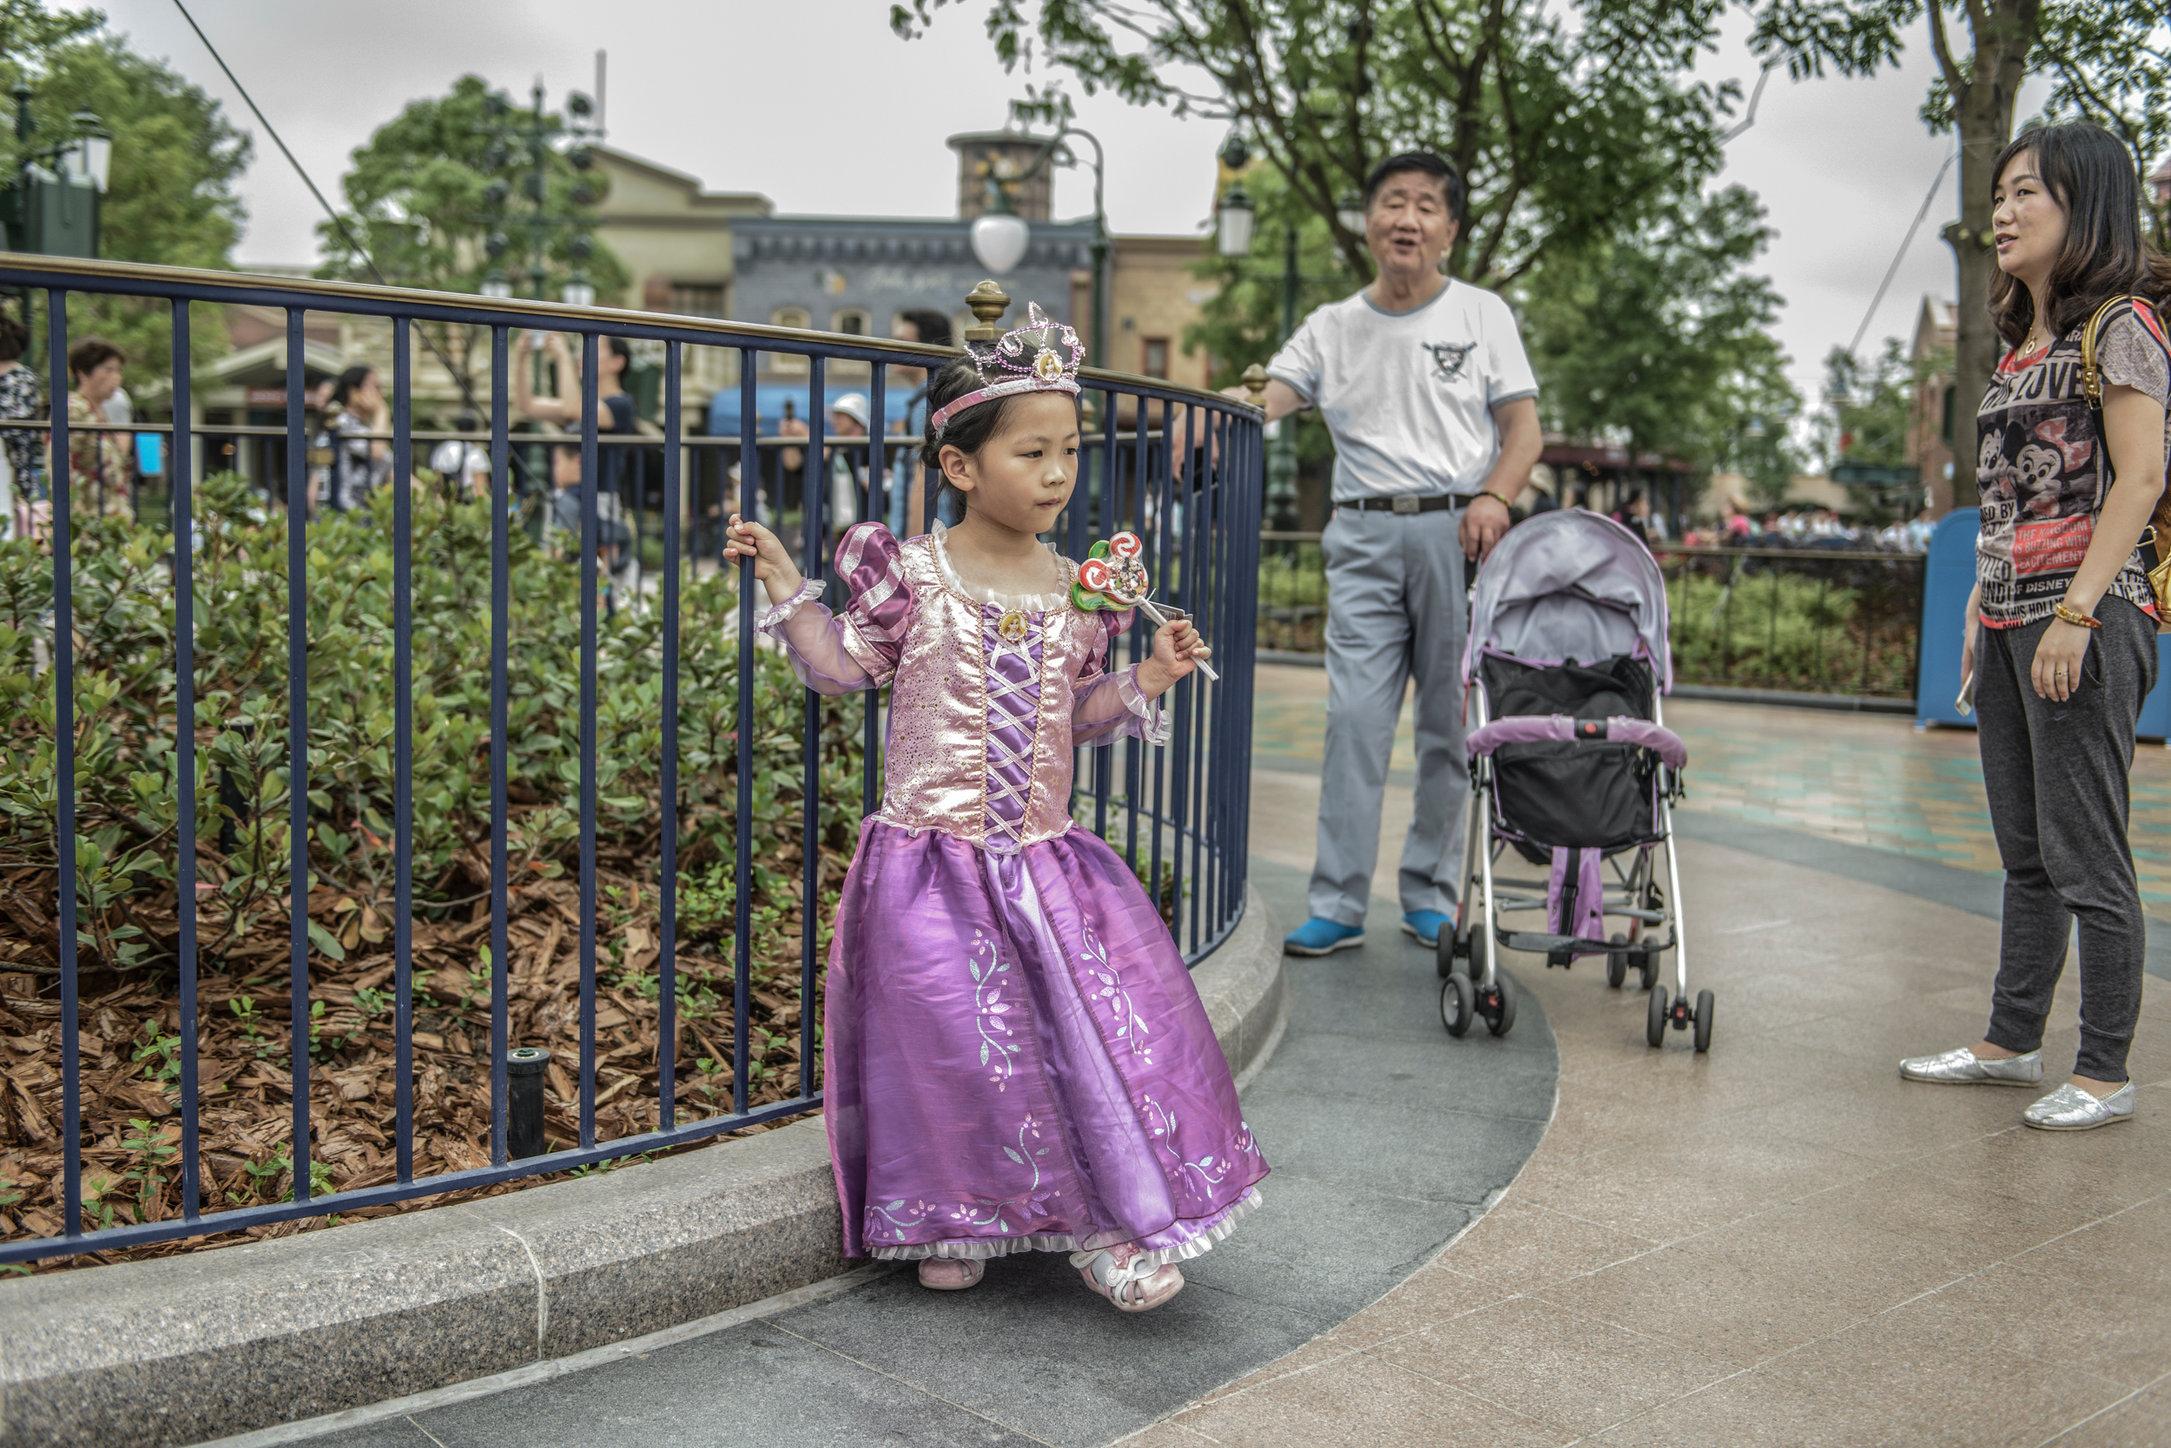 DisneylandShanghai0023.jpg